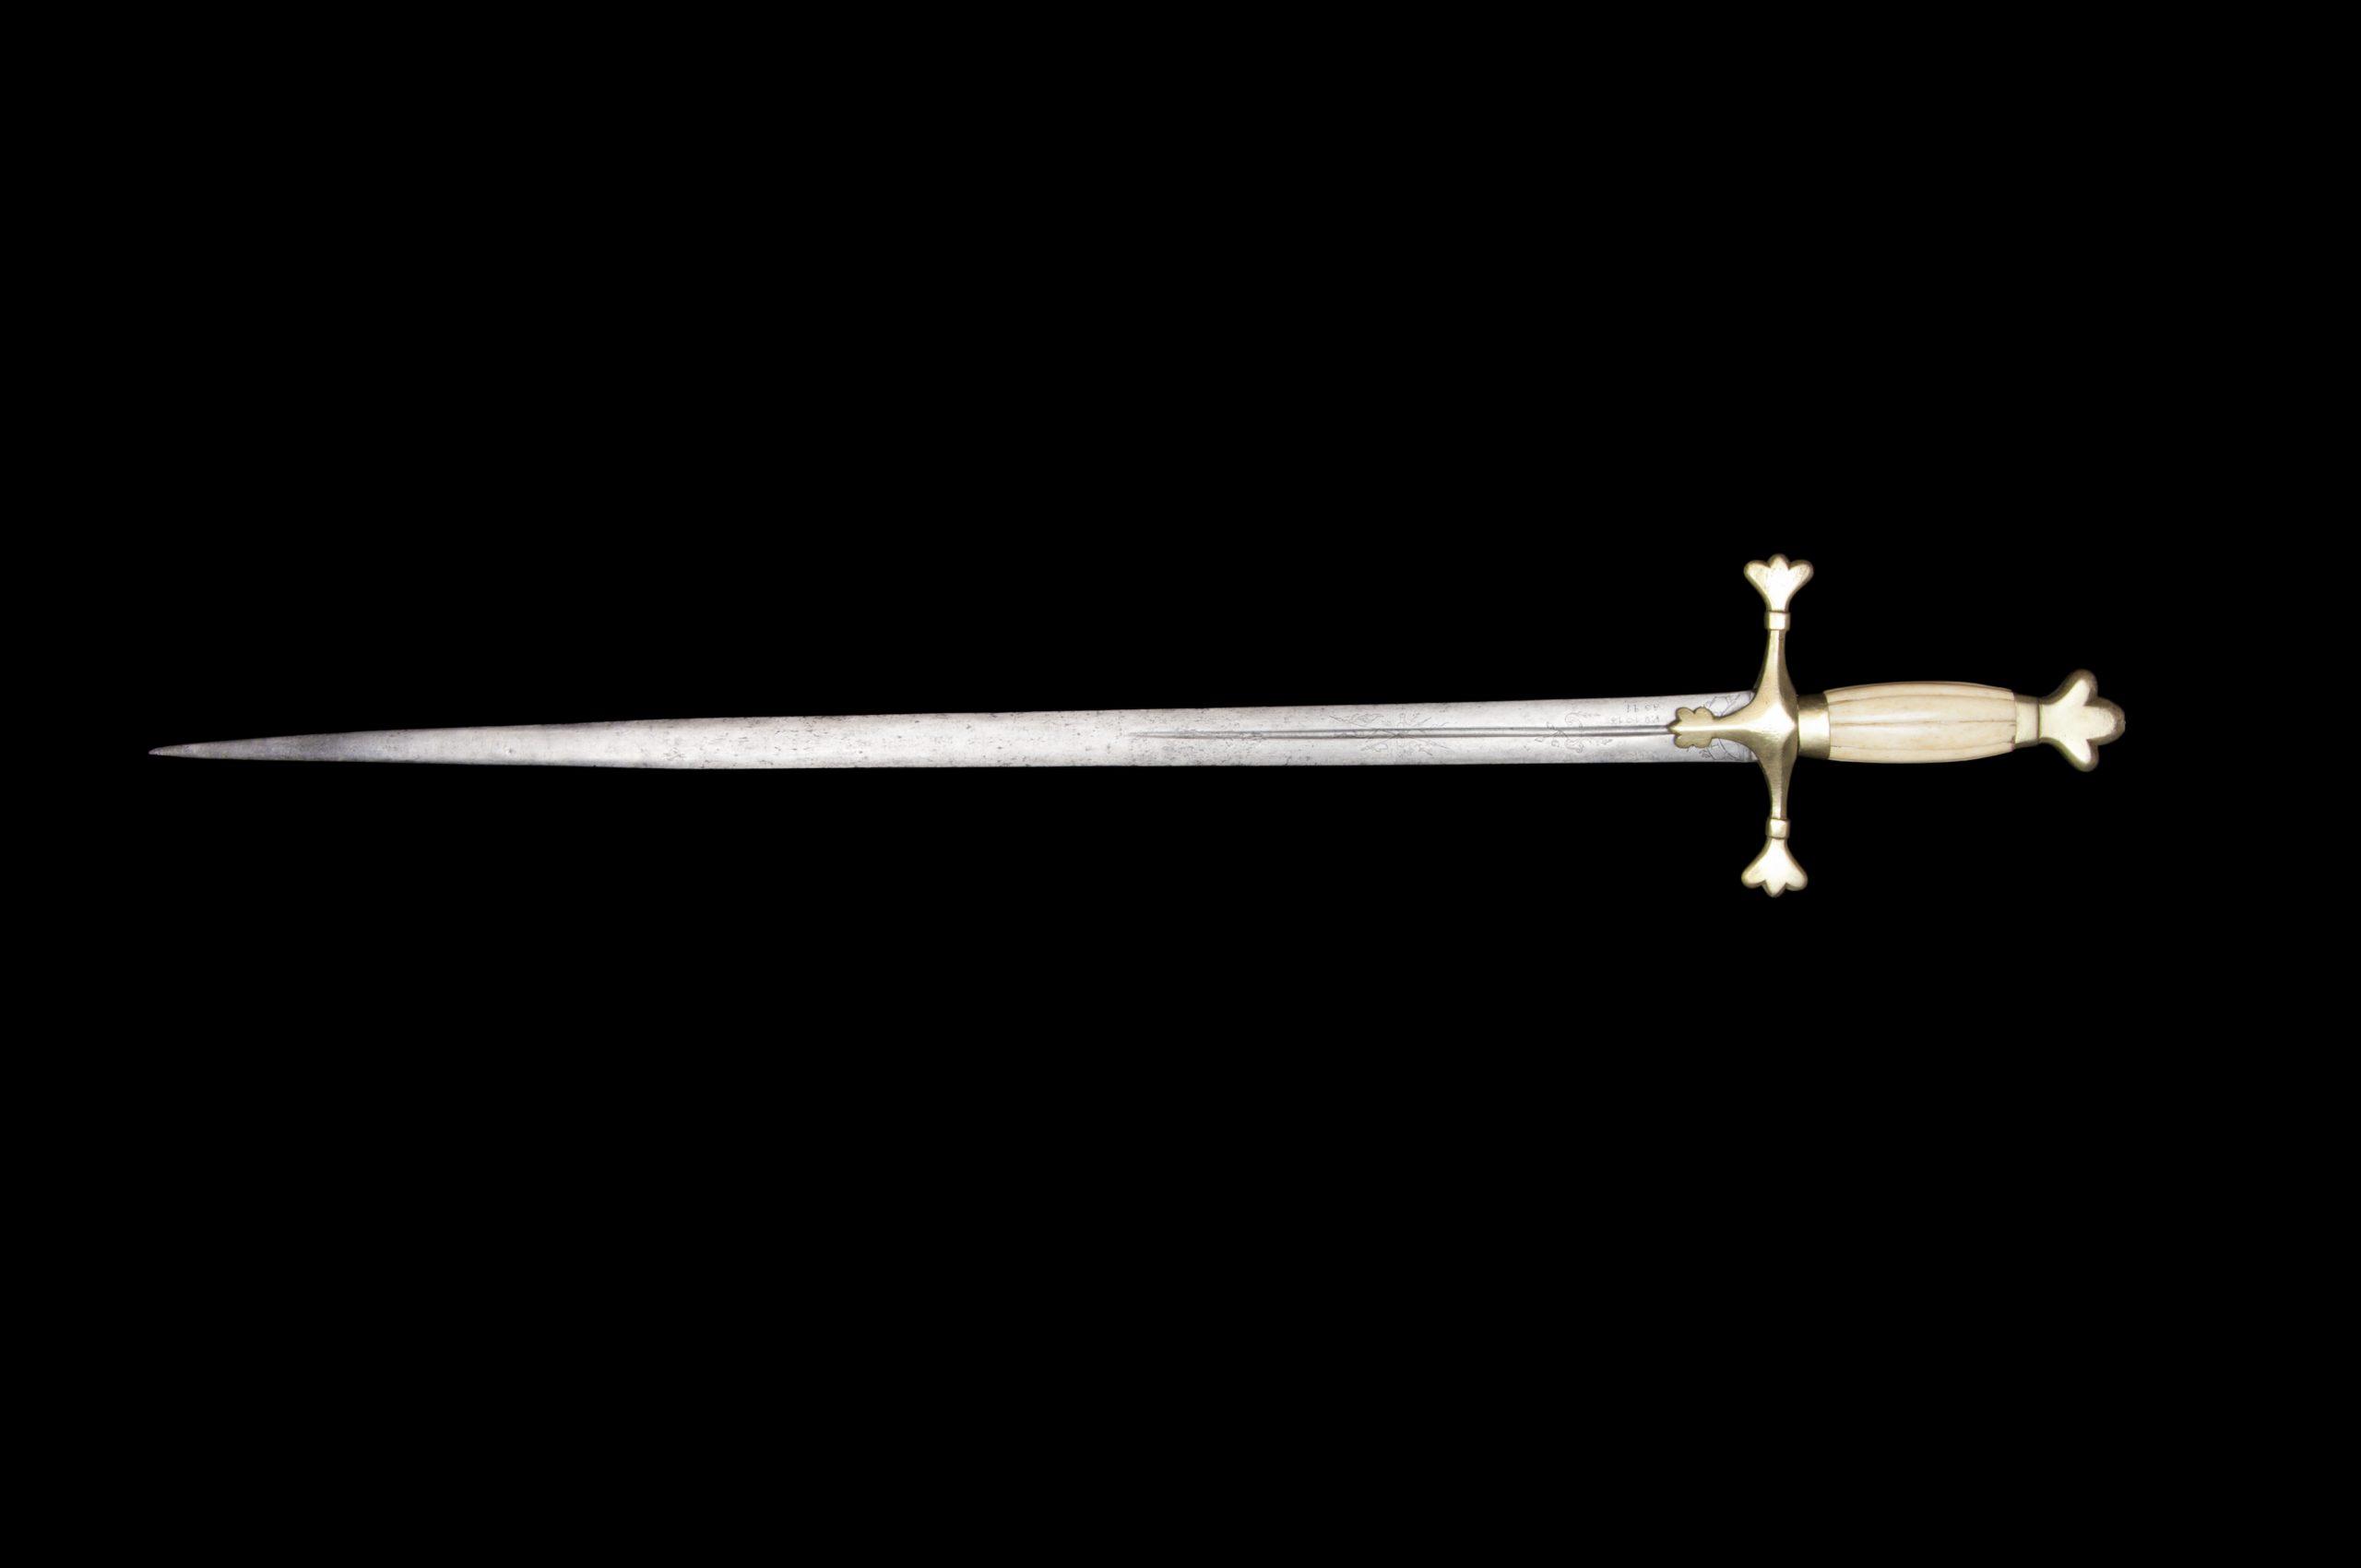 Objeto museológico (espada)